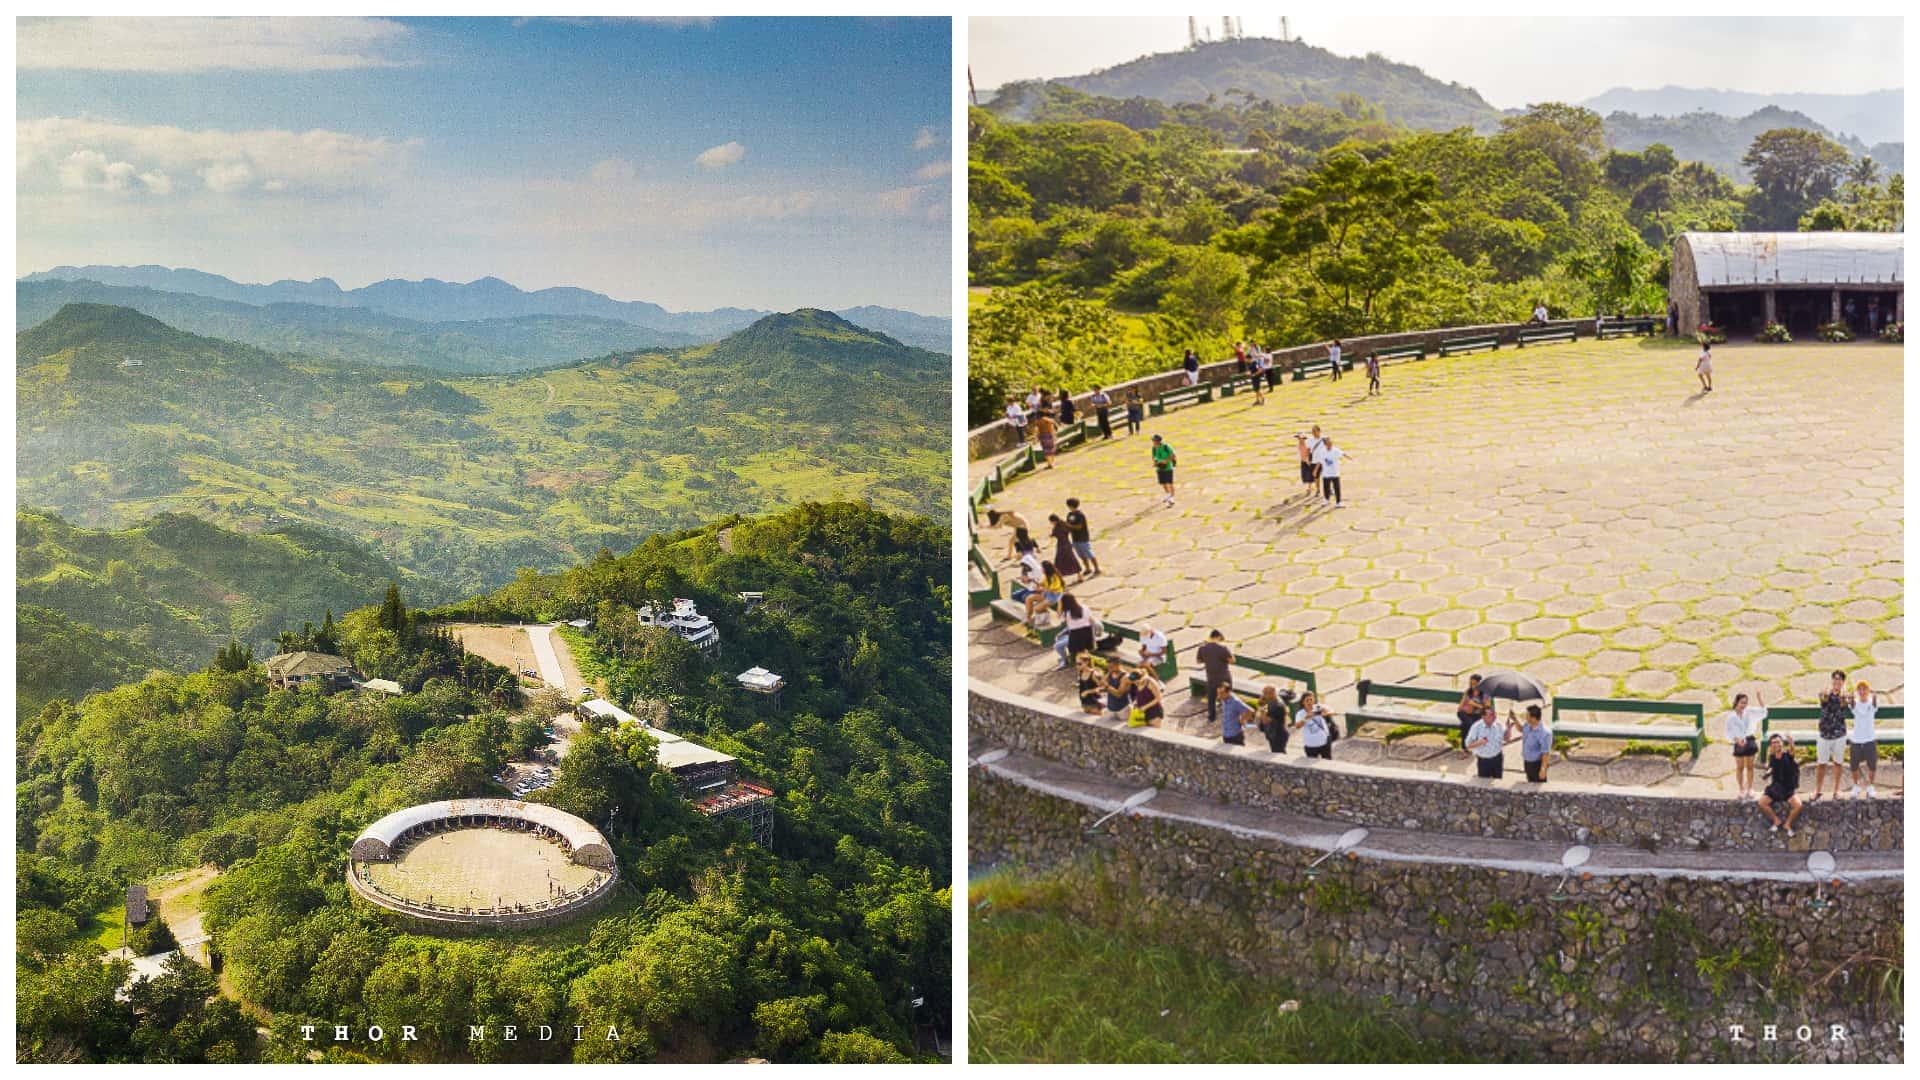 Tops Lookout: The top attraction for overlooking Cebu